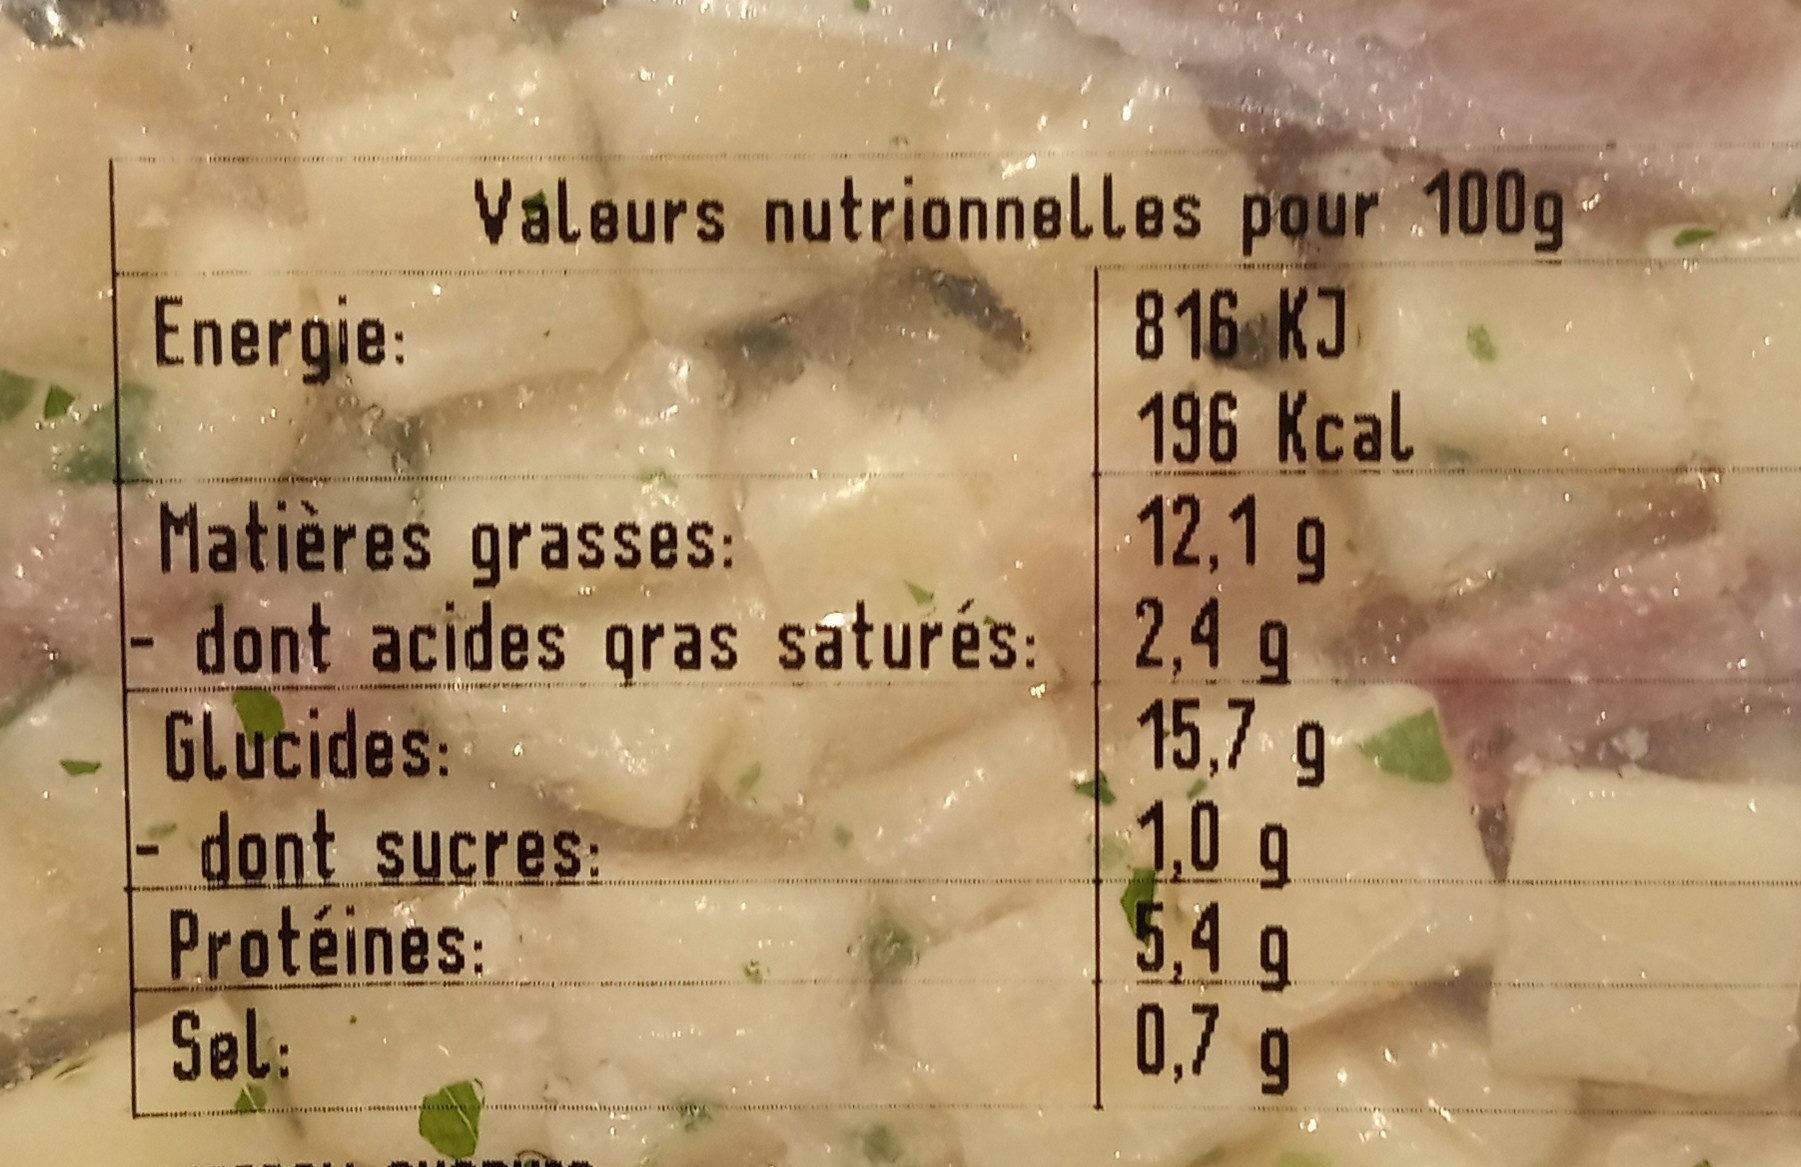 Salade savoyarde - Nutrition facts